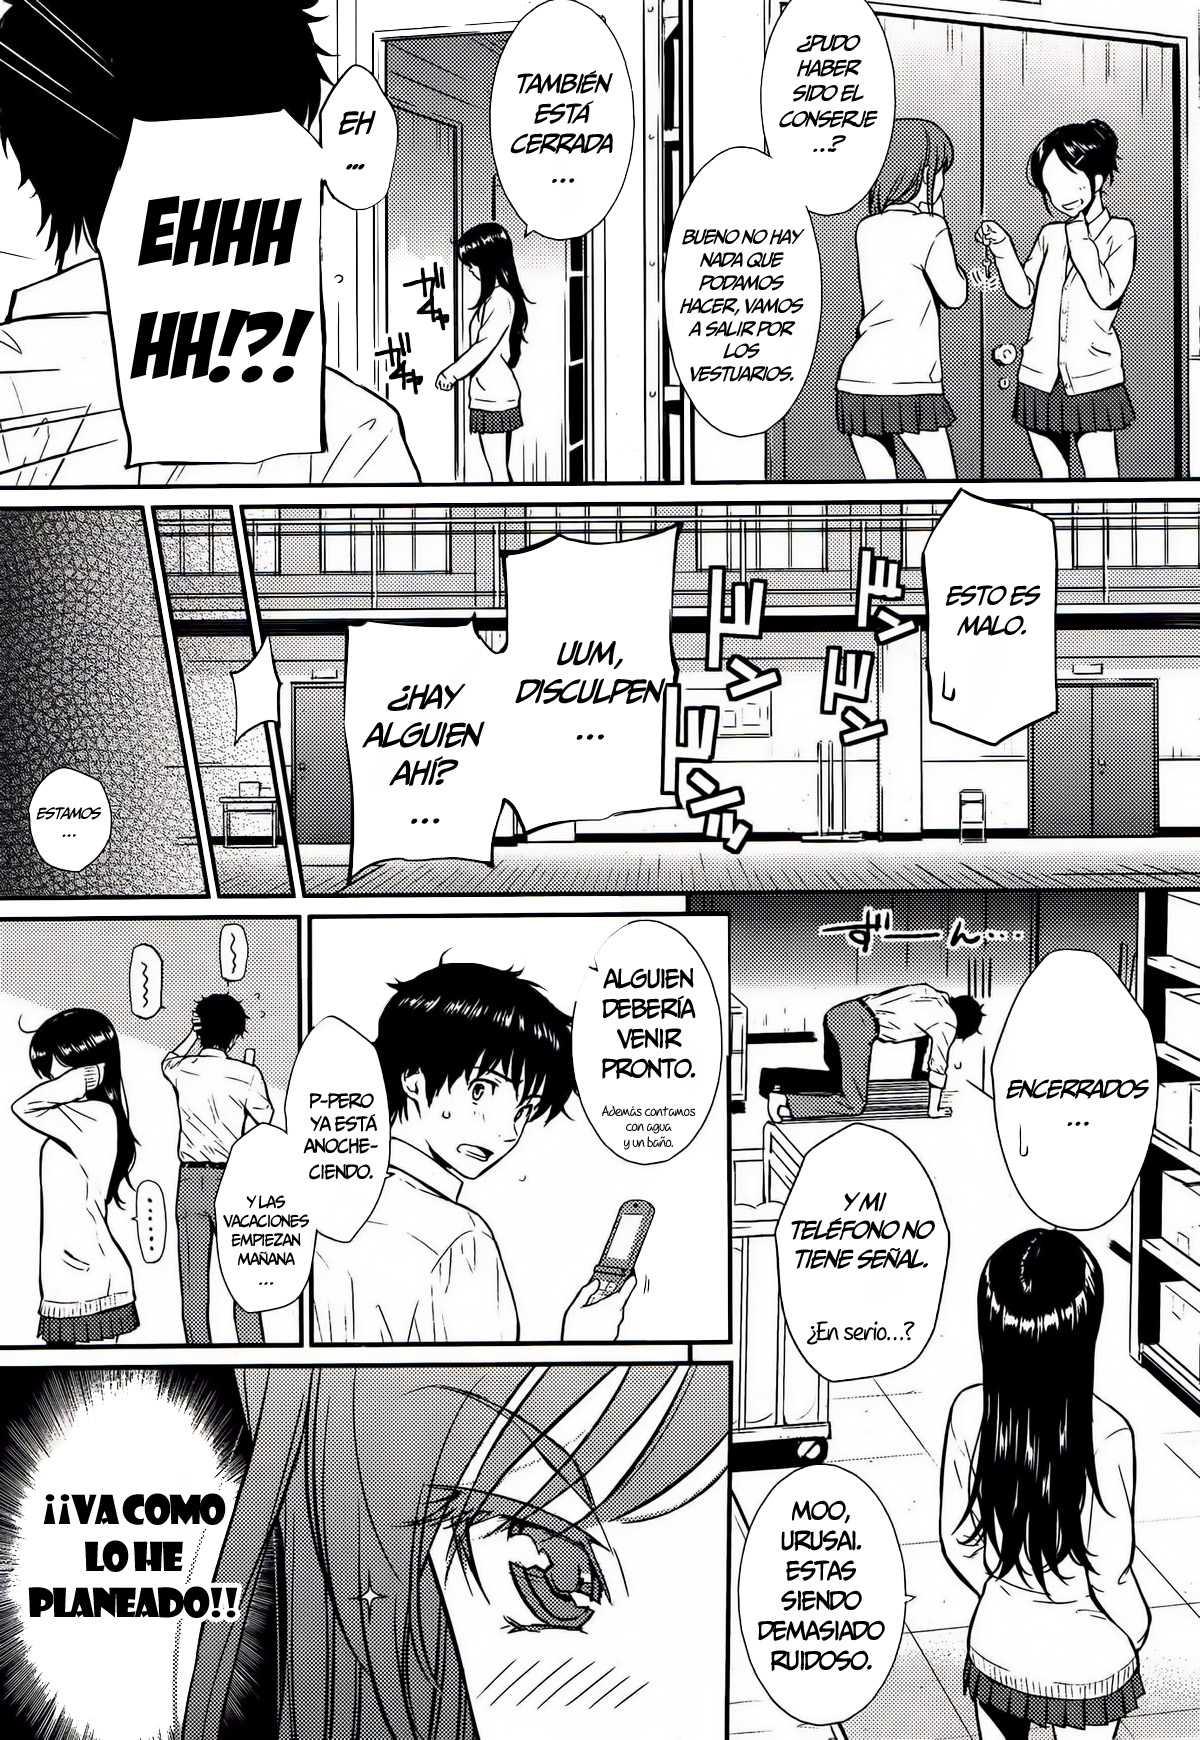 Manga porno i lock you español Homunculus I Lock You Comic Kairakuten 2012 08 Espanol Spanish Read Online Free Download 1 3